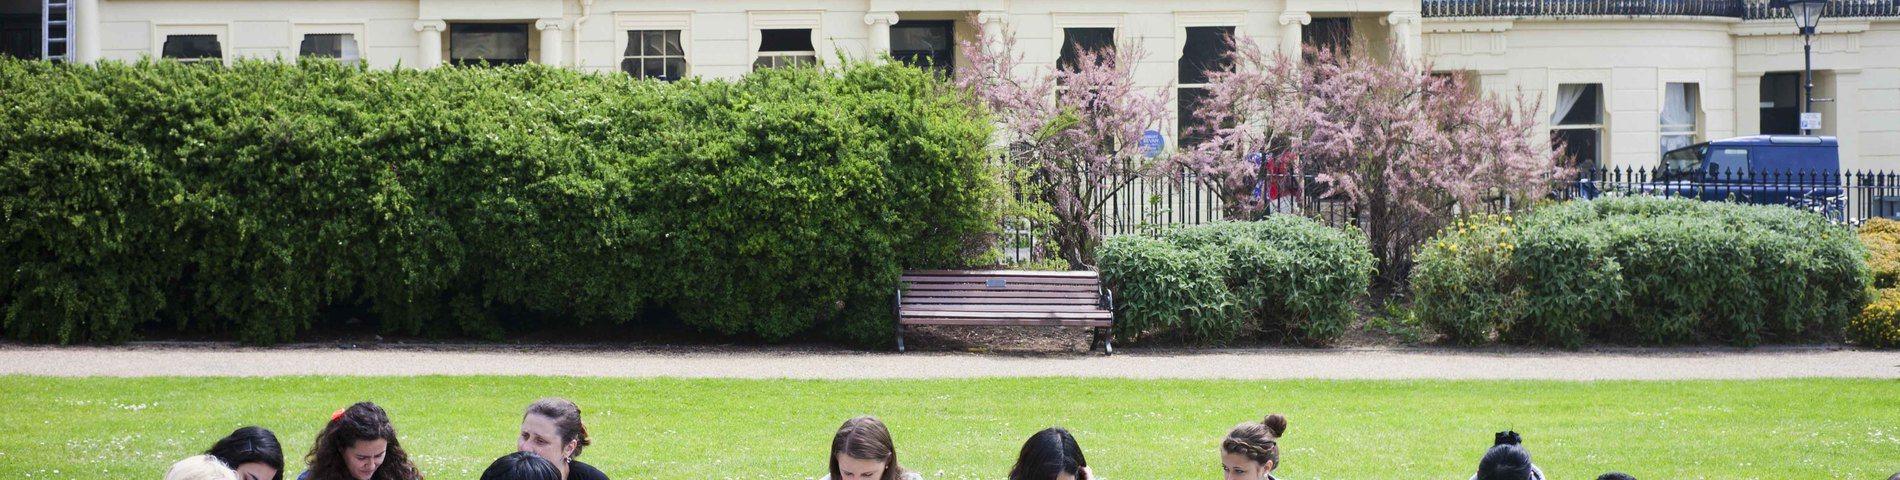 Oxford International Education bild 1